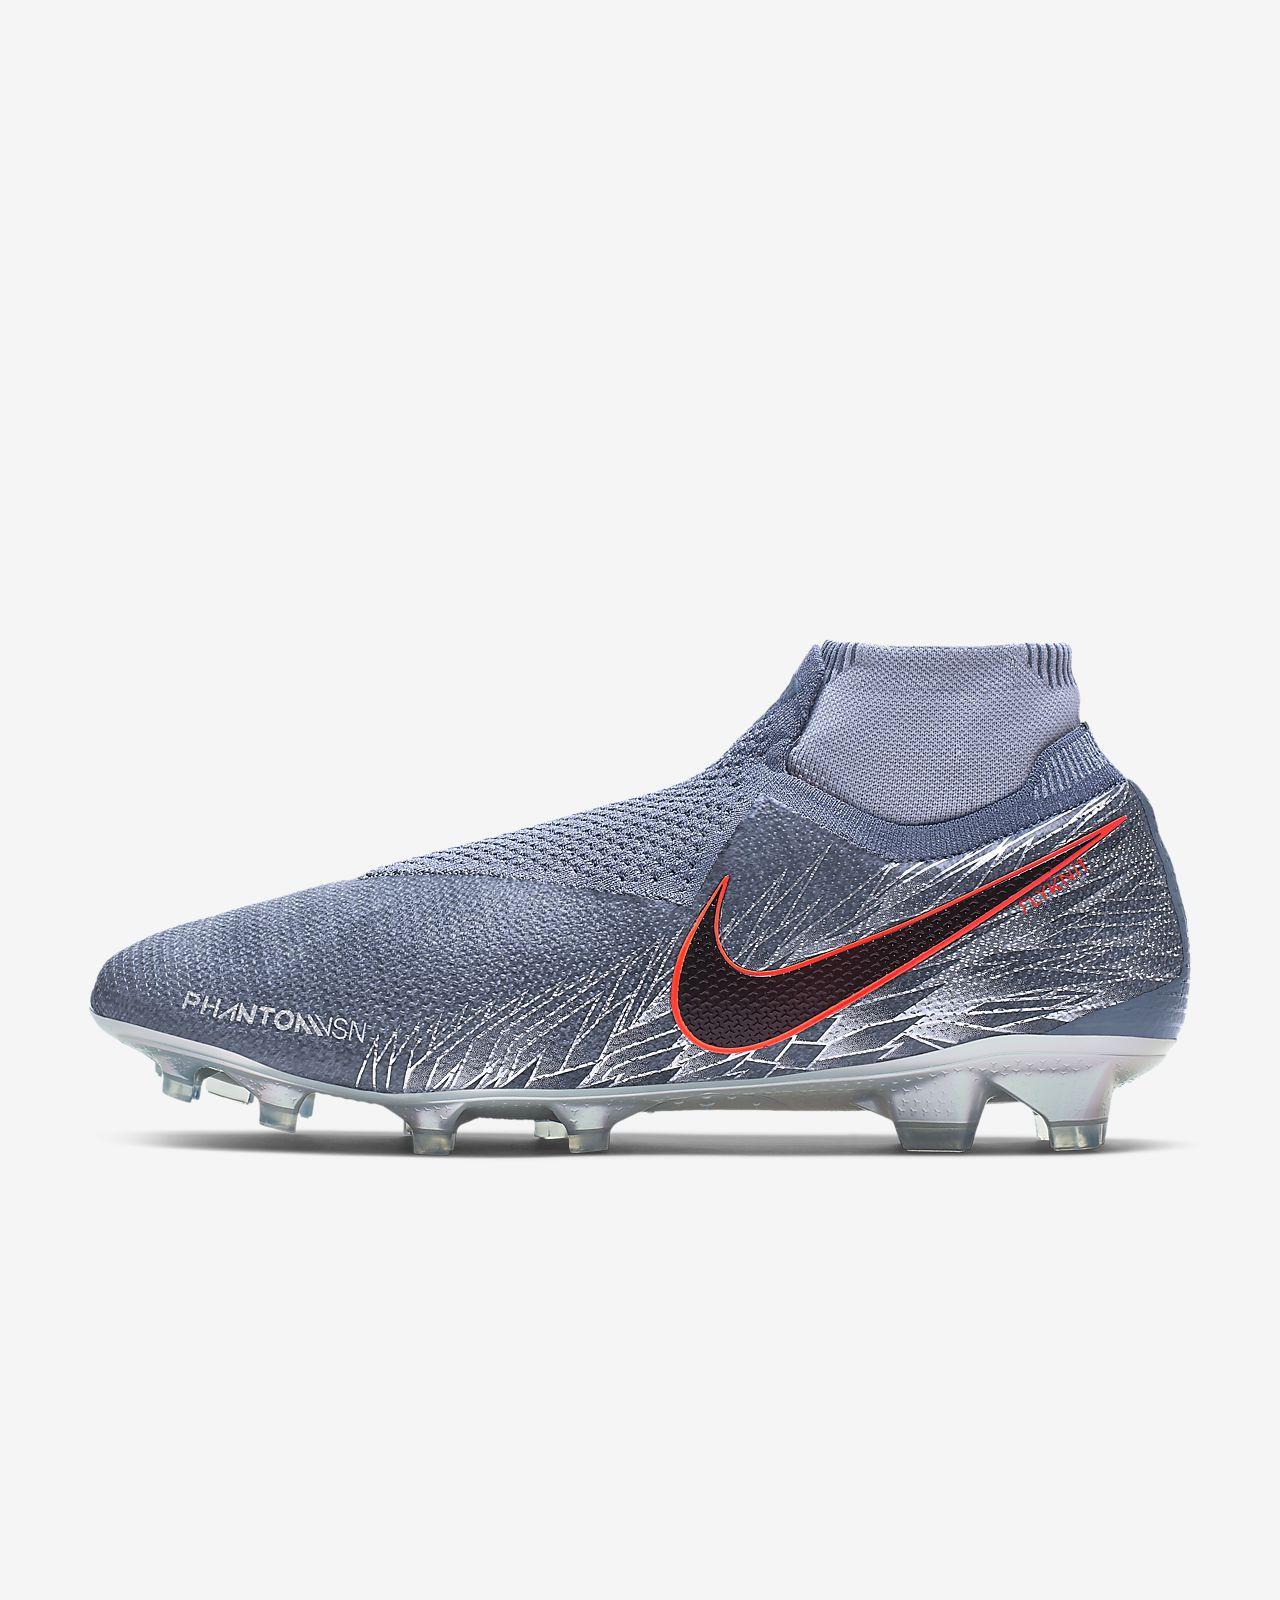 designer fashion 1f270 ae32a ... Chaussure de football à crampons pour terrain sec Nike Phantom Vision  Elite Dynamic Fit FG